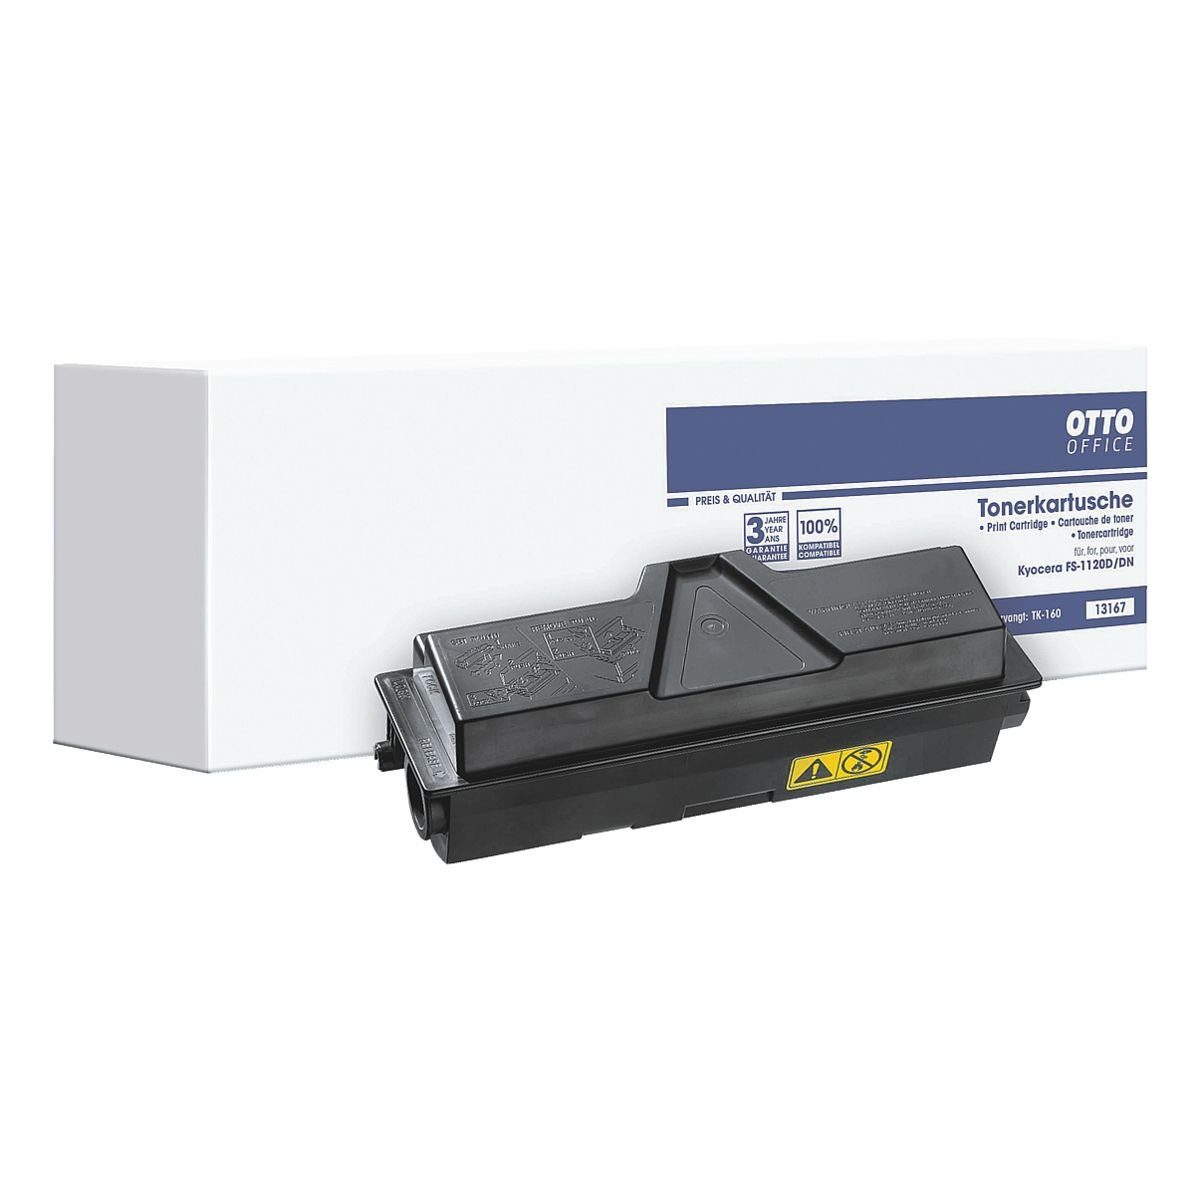 OTTO Office Standard Tonerkassette ersetzt Kyocera »TK-160«